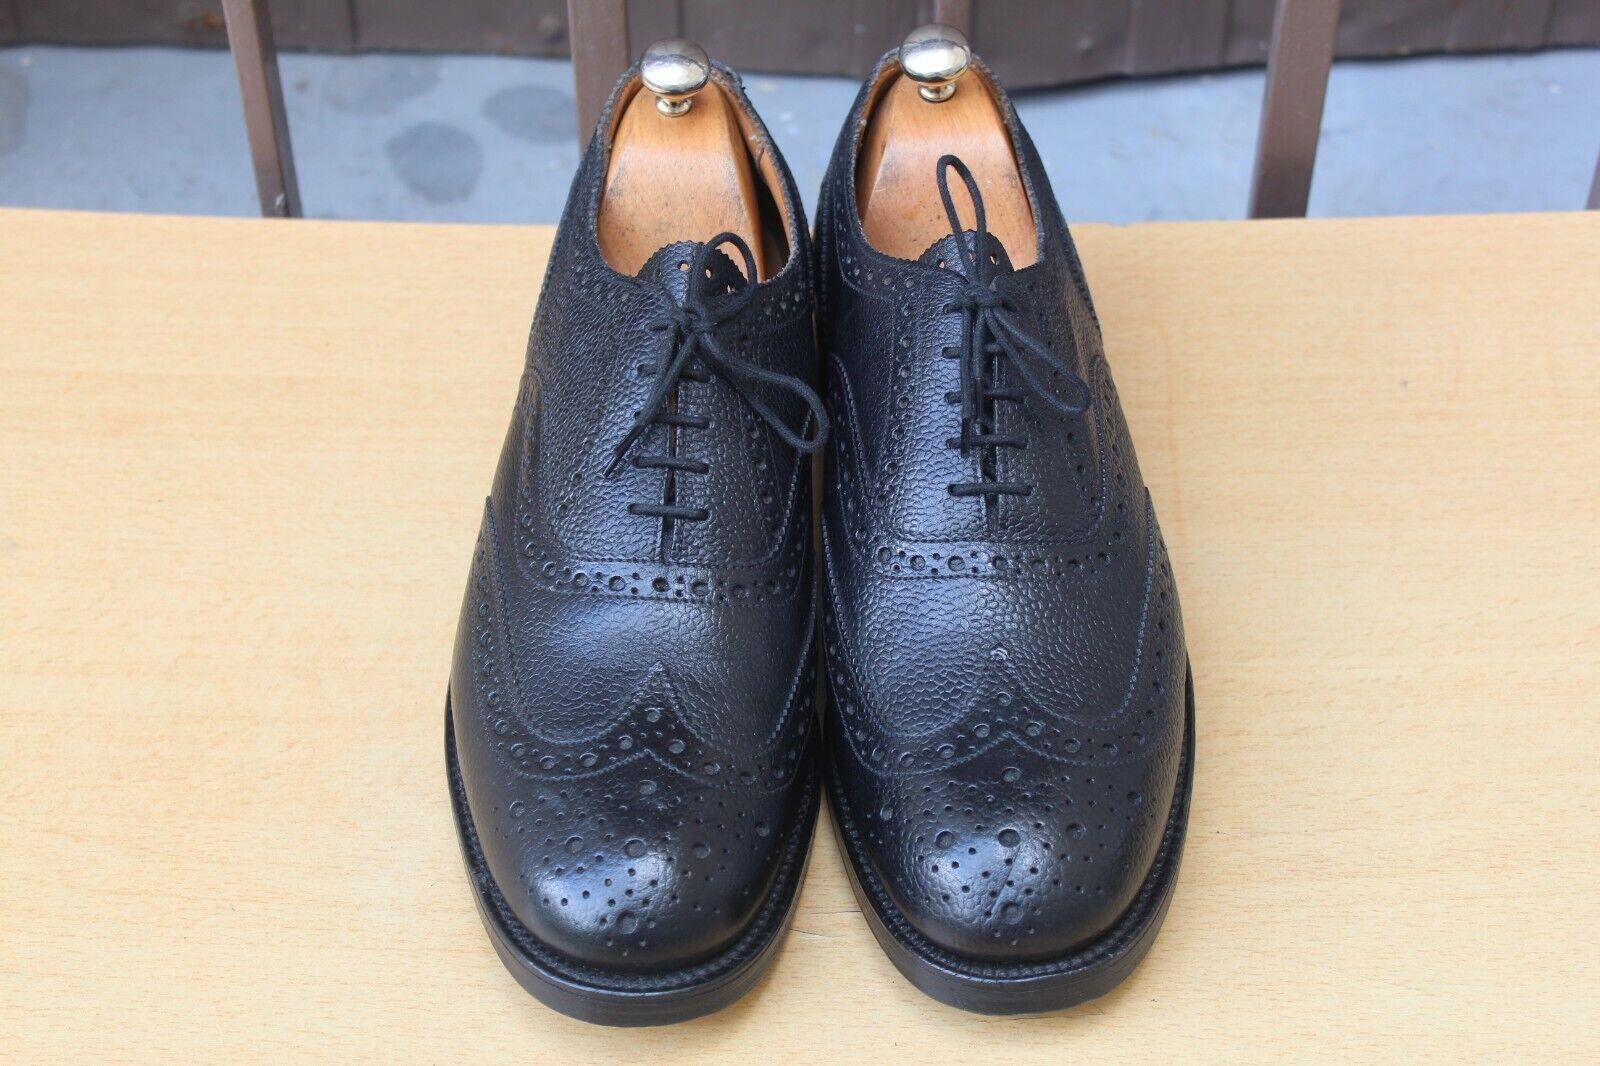 zapatos SANDERS RICHELIEU CUIR GRAINE 10   44 hombres zapatos 349 EUROS